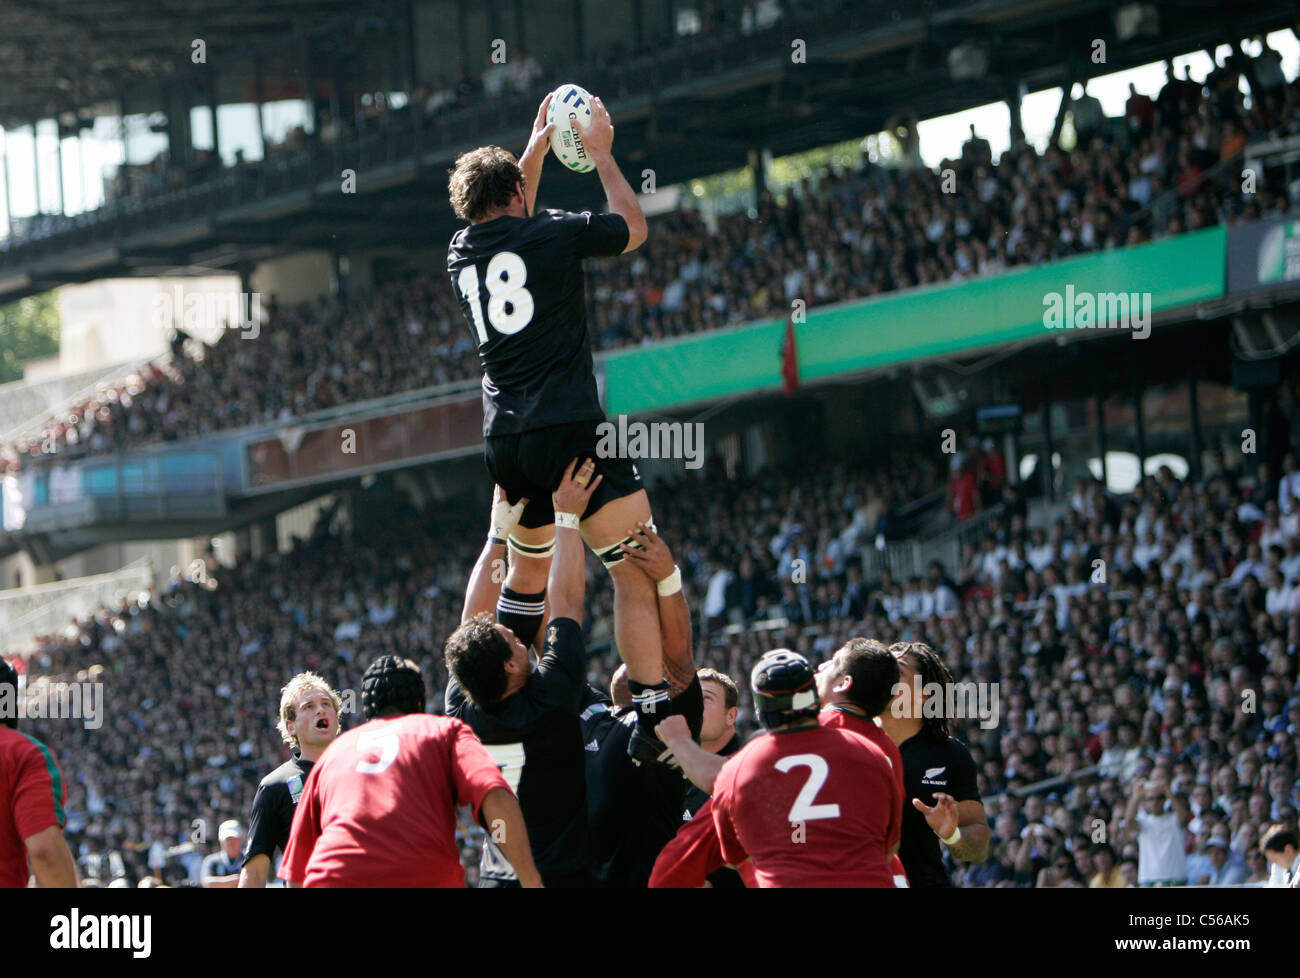 Carl HAYMAN Rugby World Cup 2007 New Zealand v Portugal Stade de Gerland / Lyon/ France 15.09.07 Stock Photo